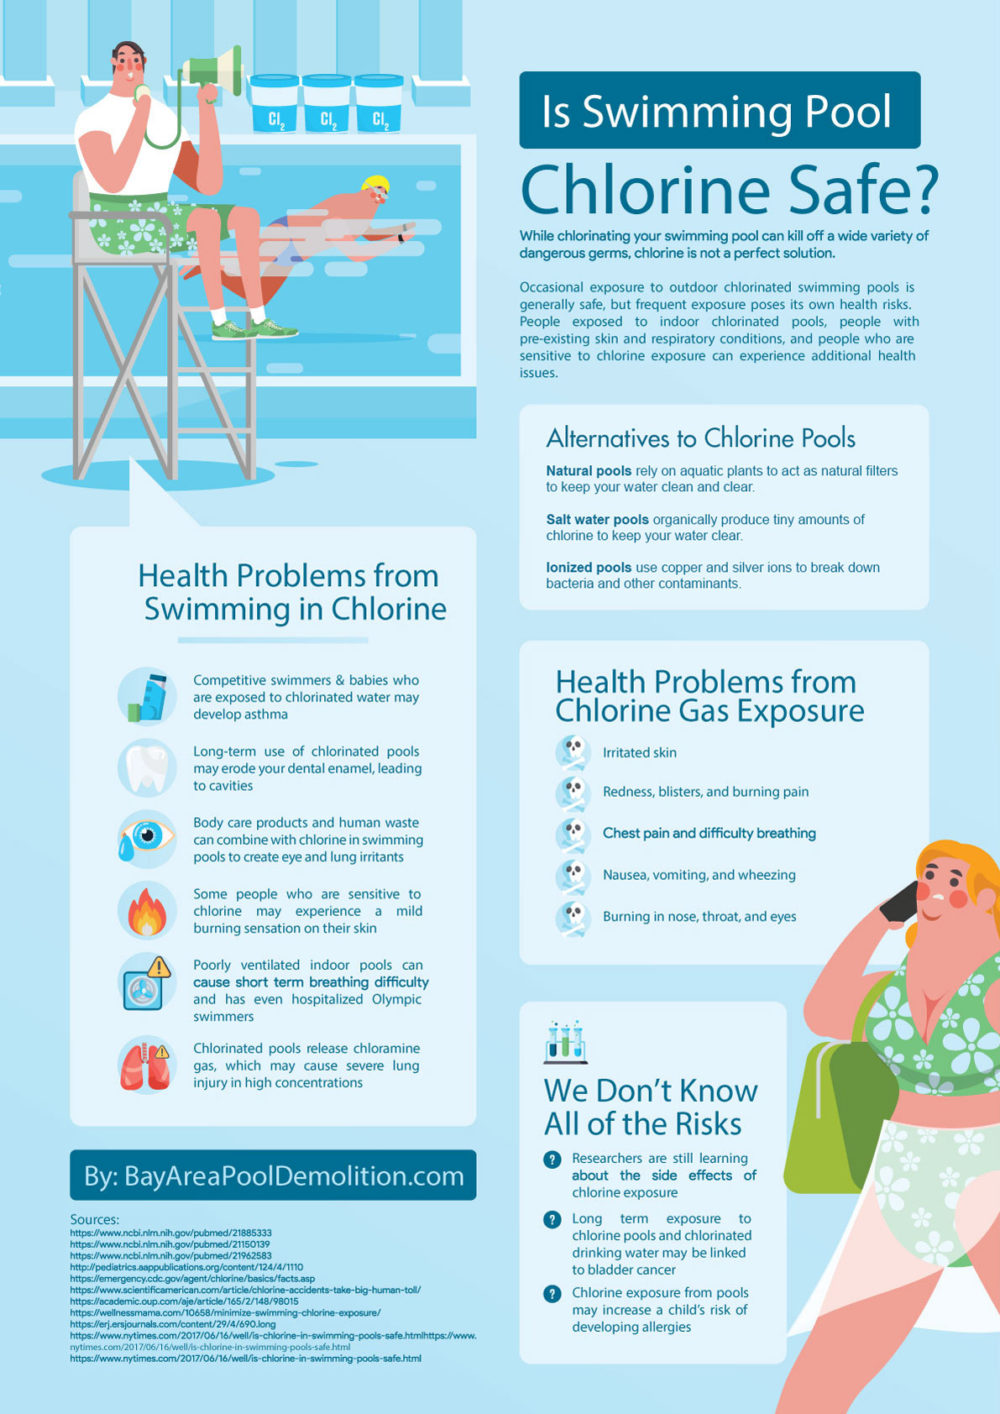 Is Swimming Pool Chlorine Safe?